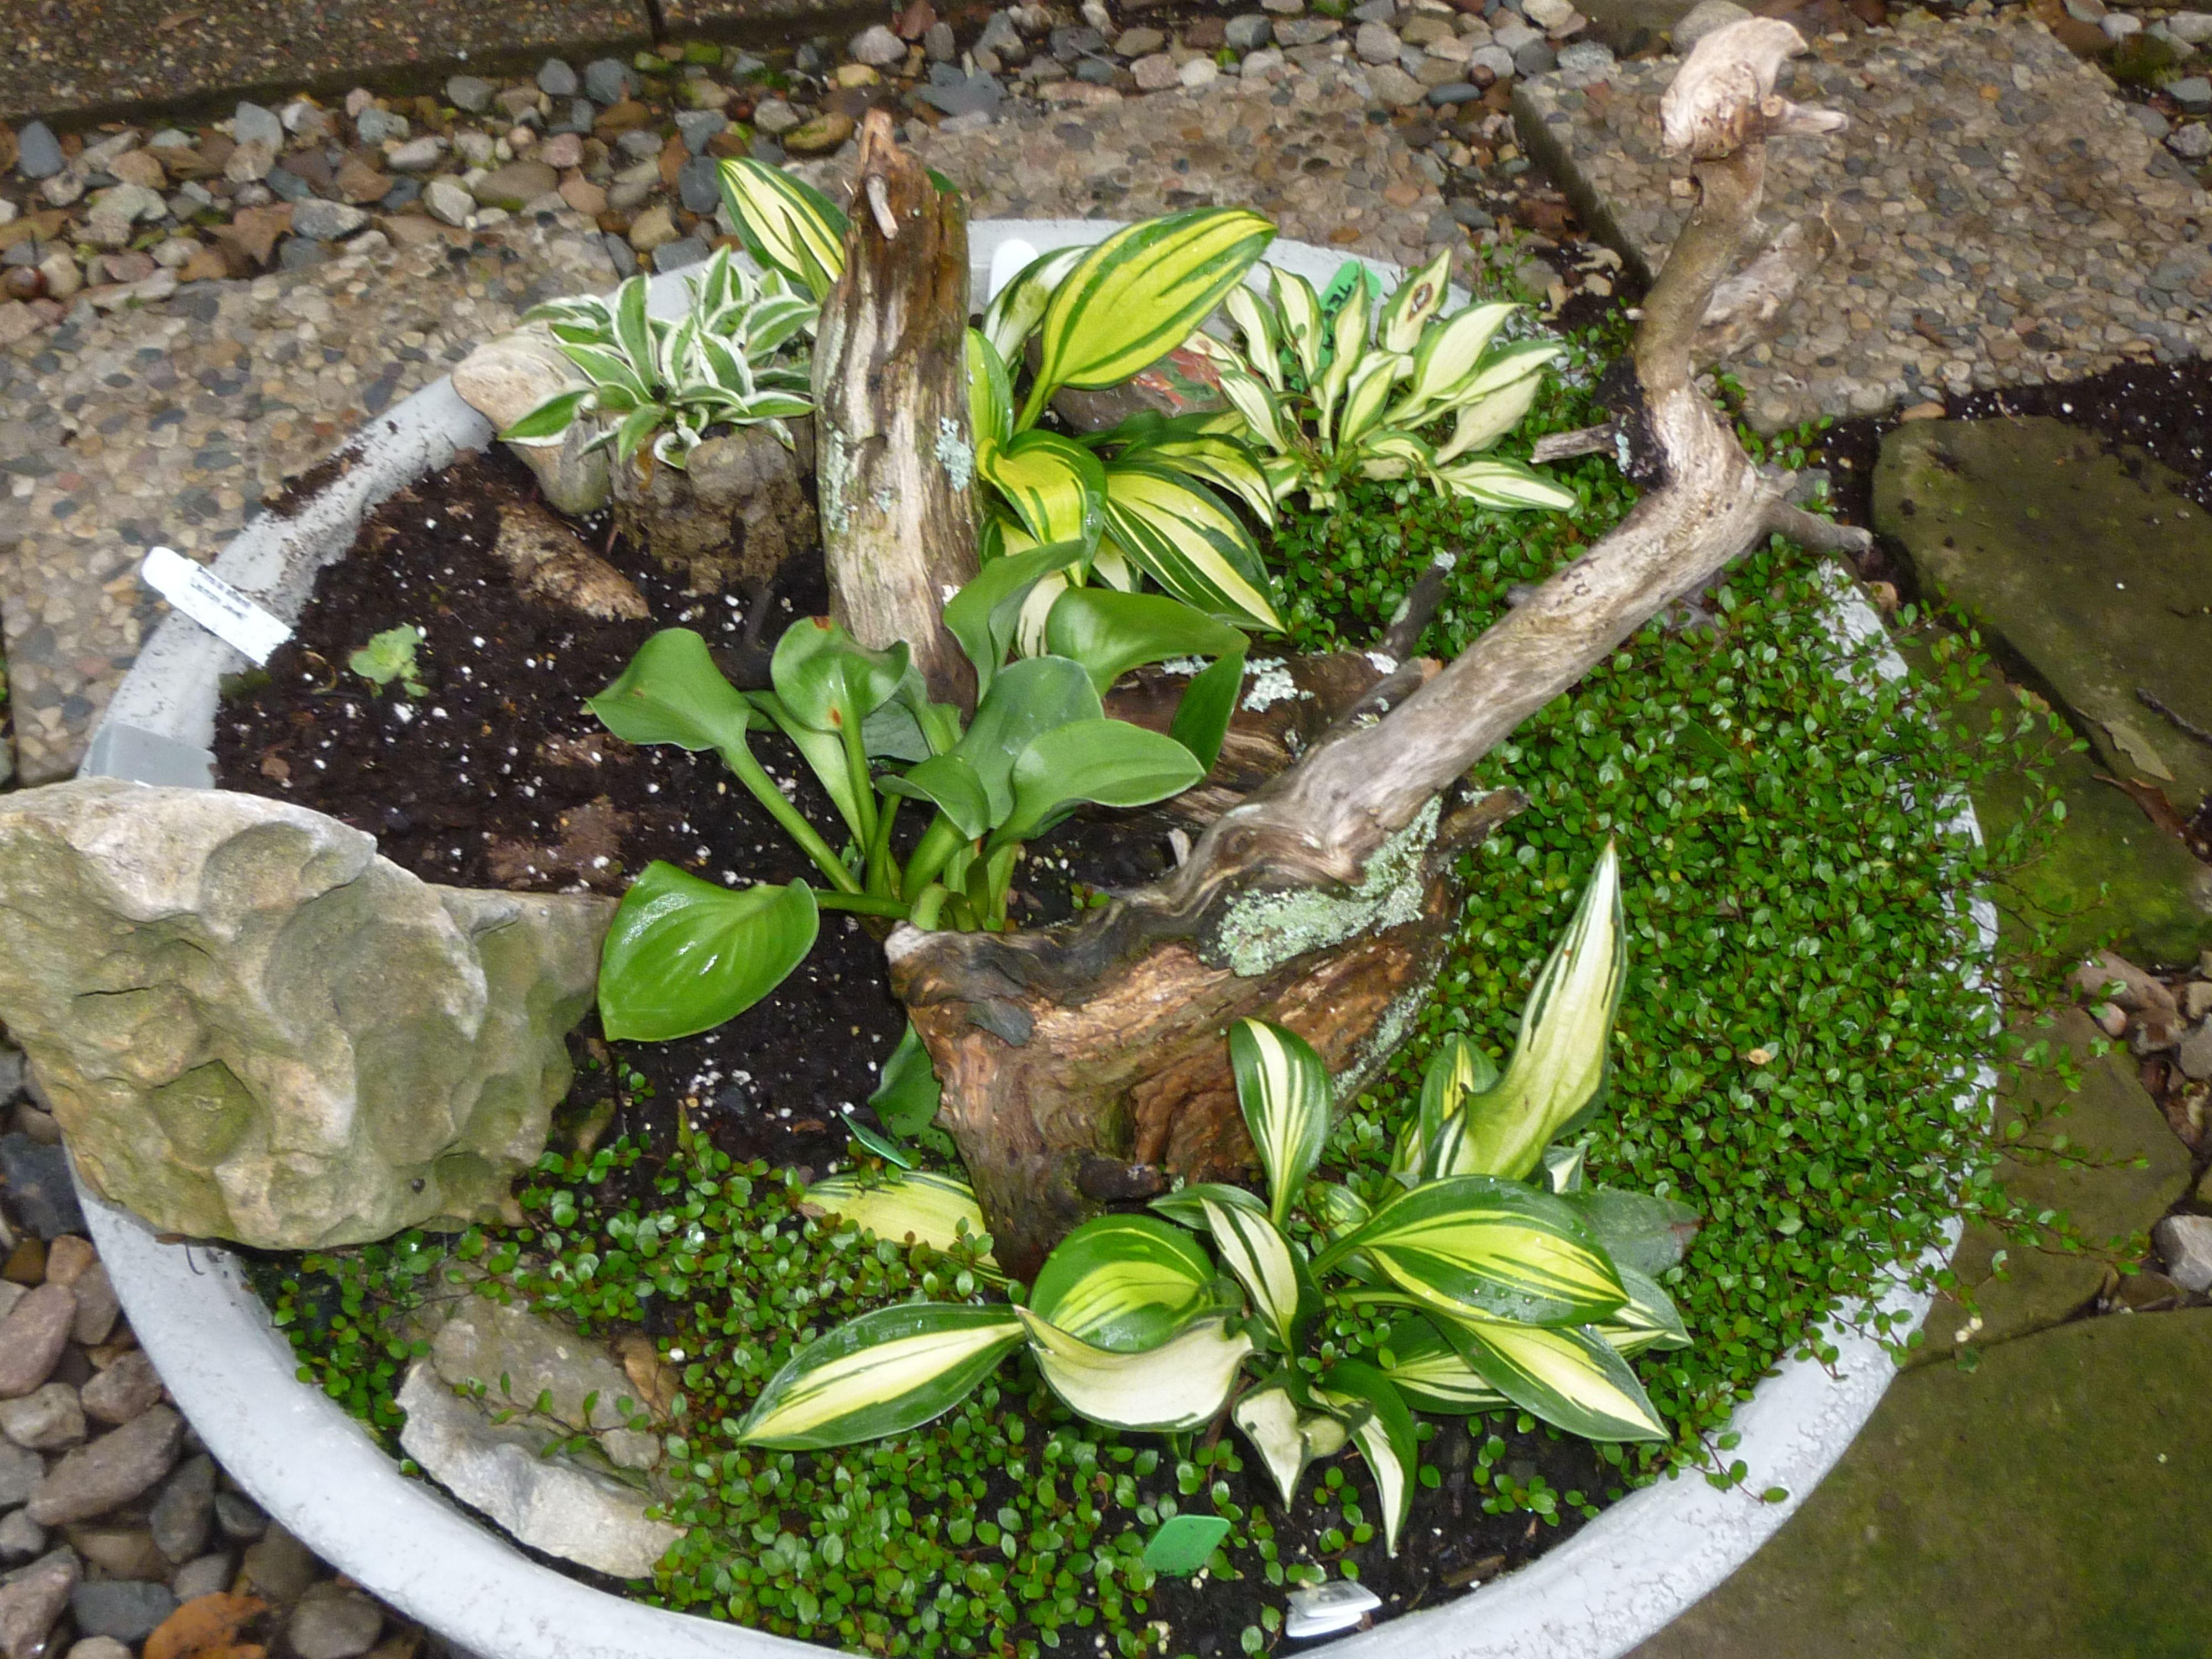 Mini Hostas Wire Vine Gardening Miniature Trough Shade